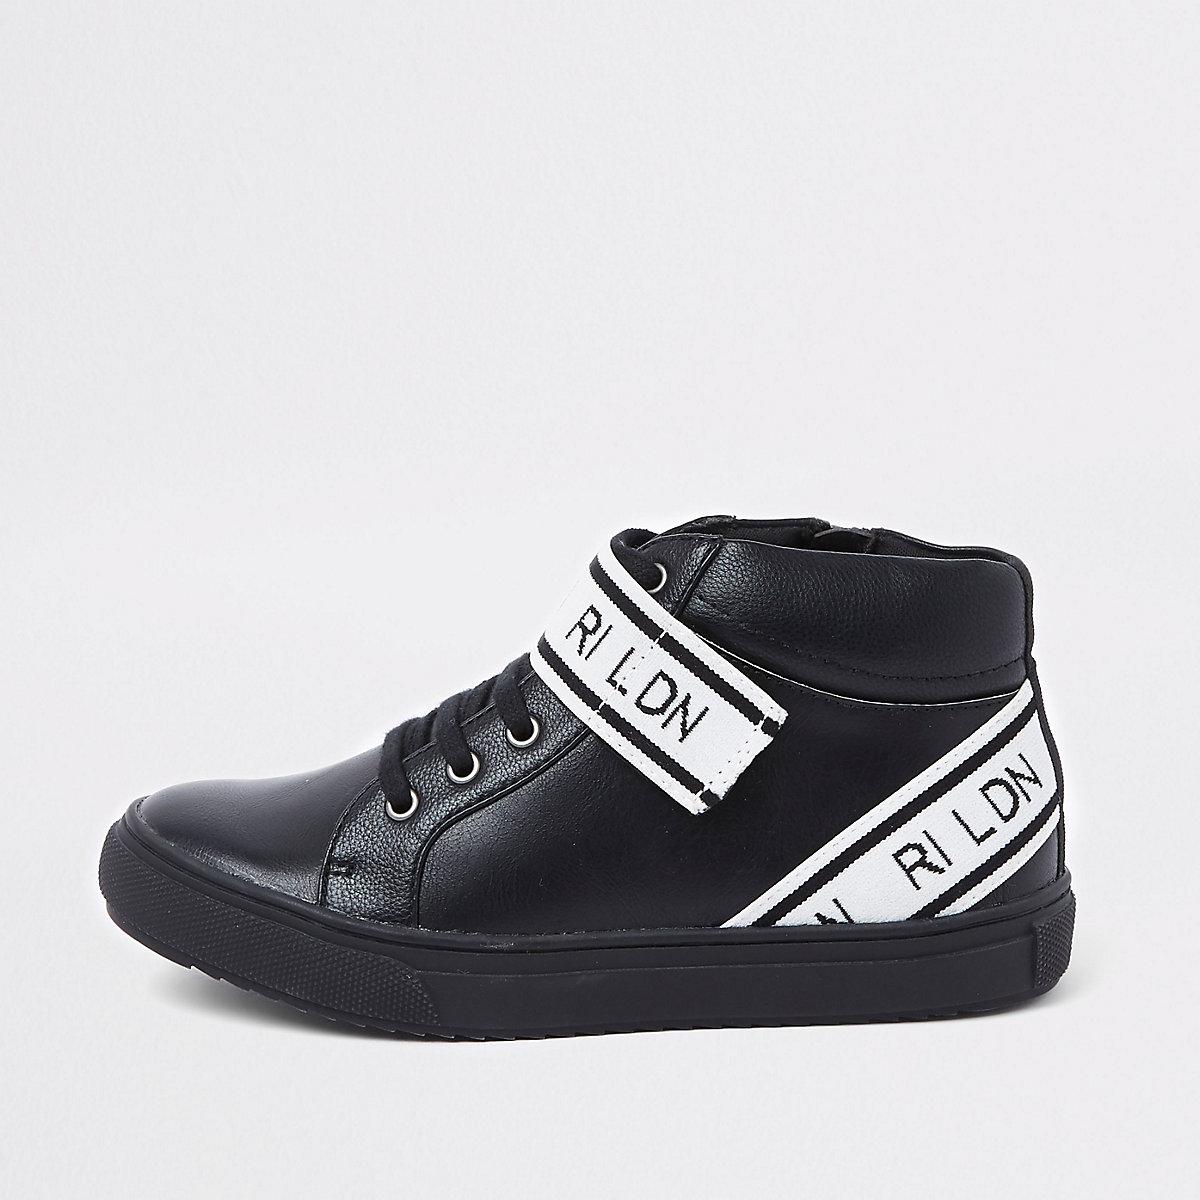 Boys black 'RI LDN' strap high top sneakers